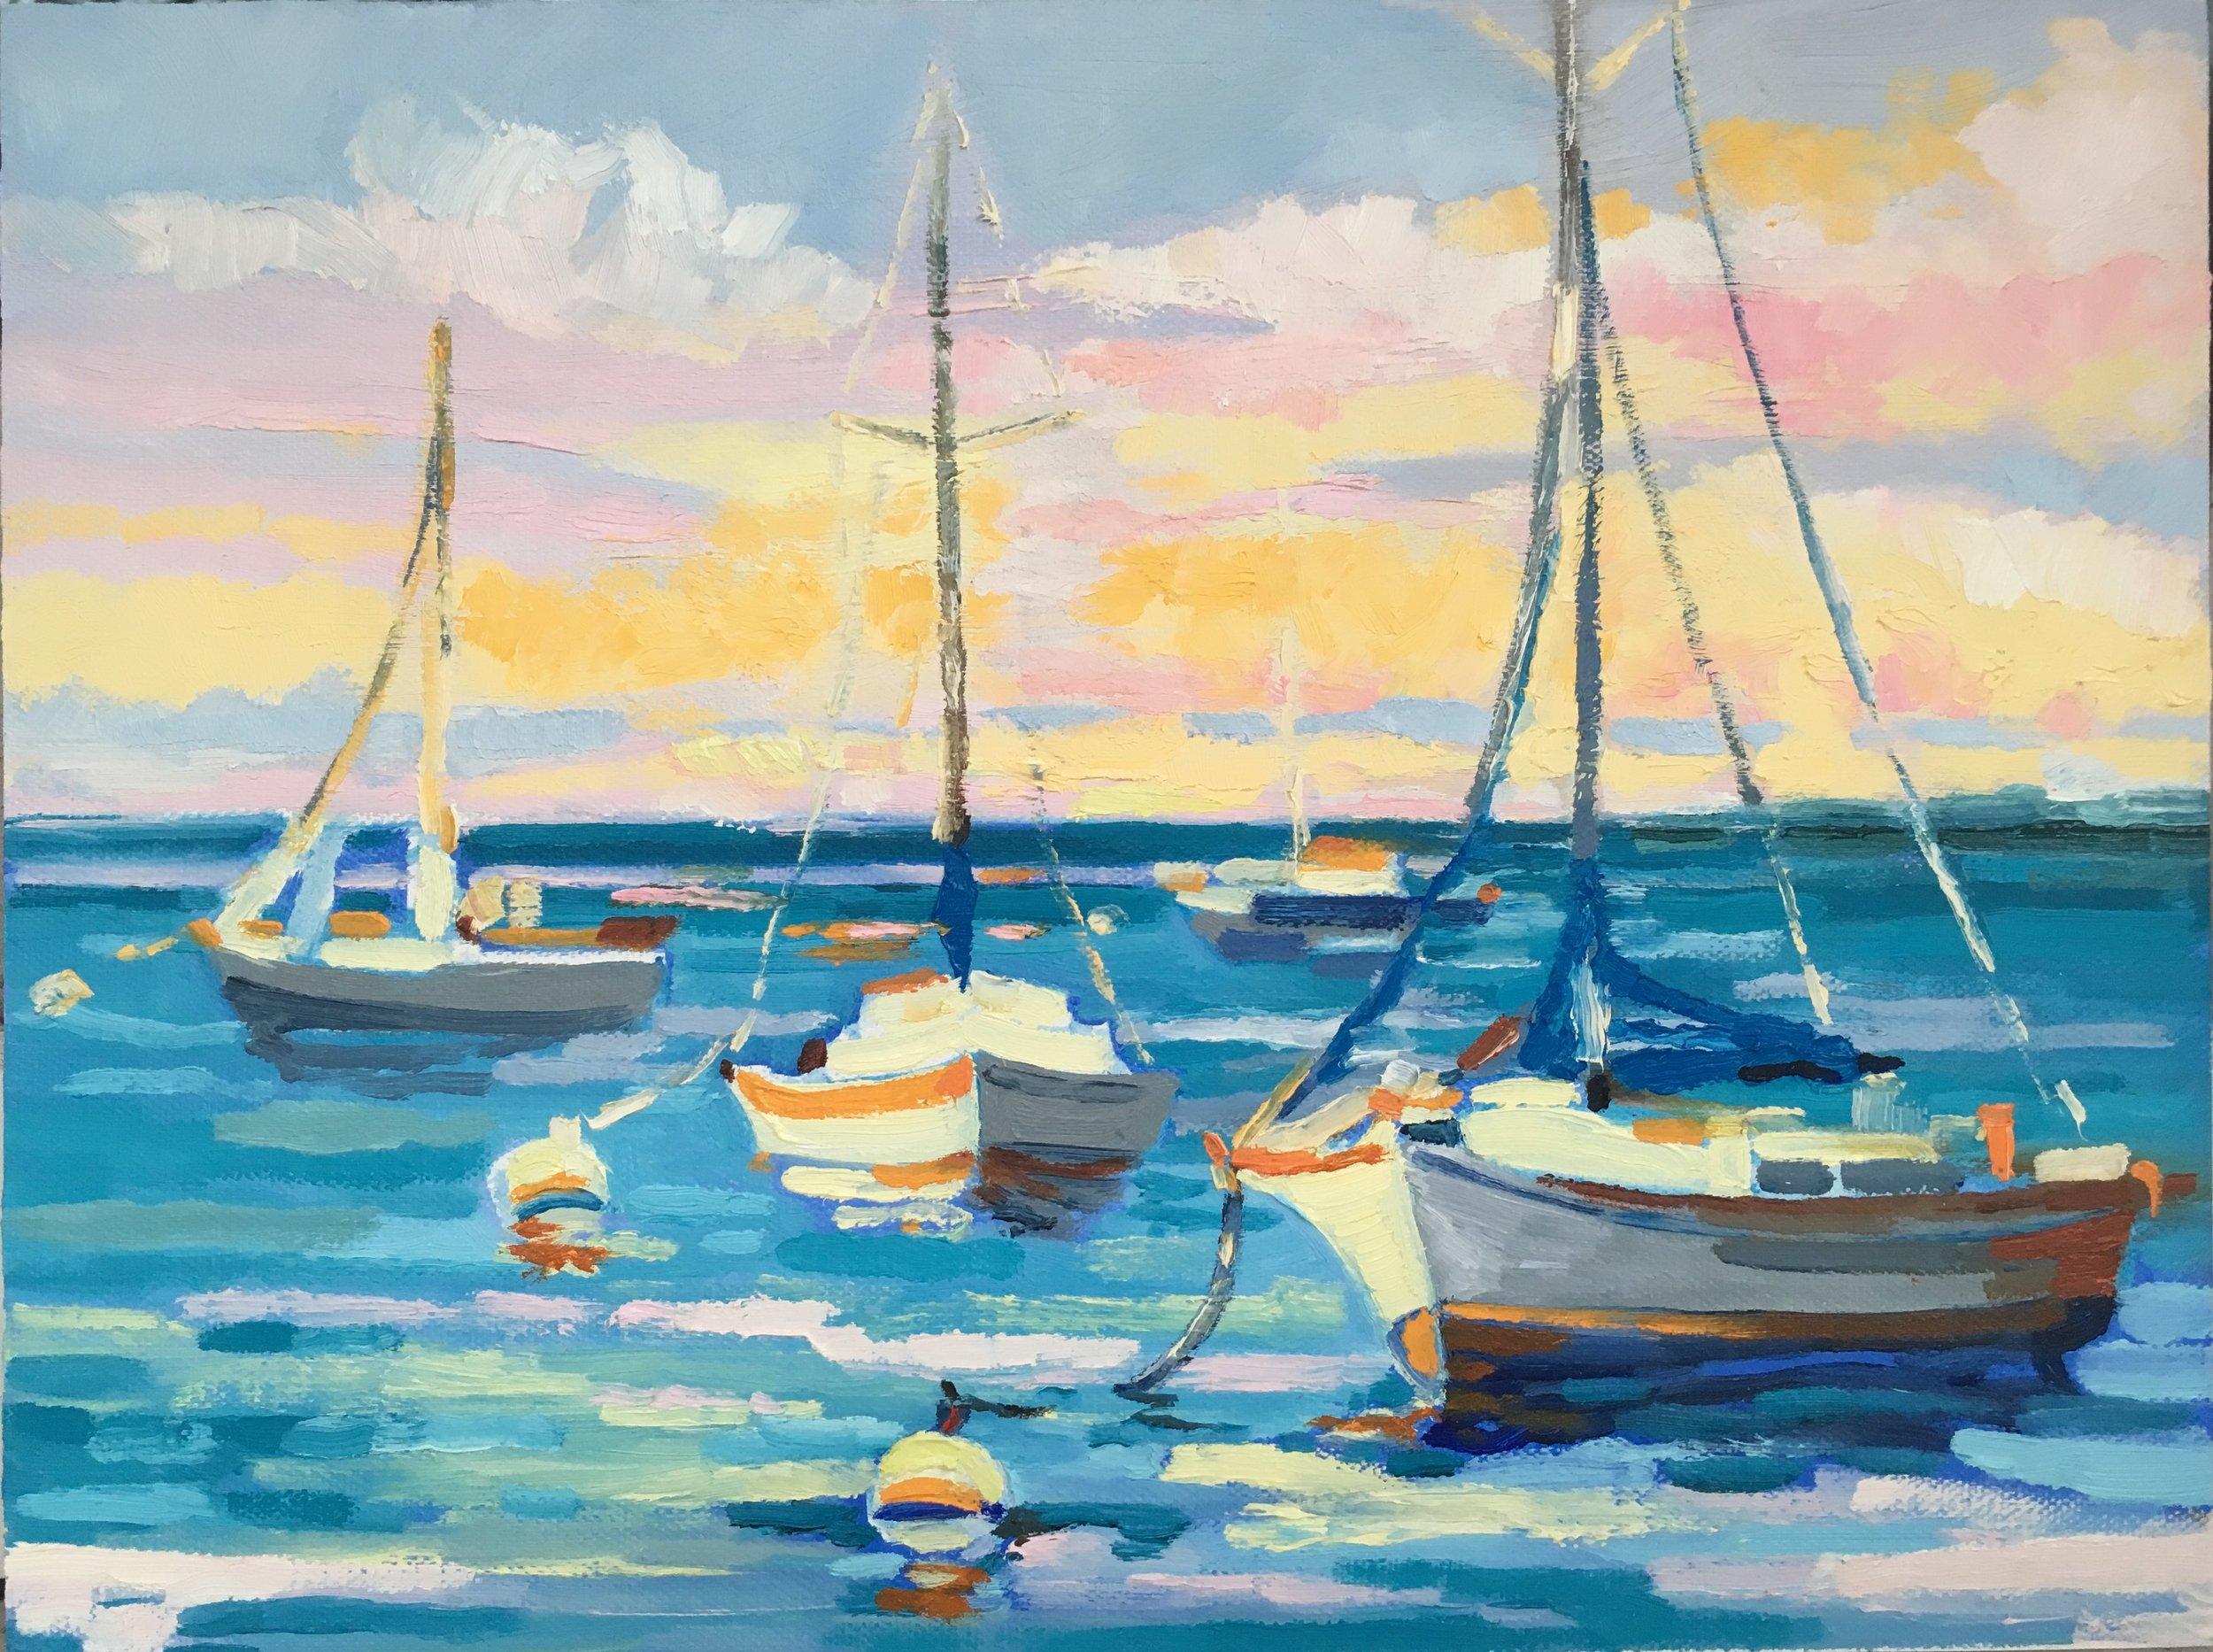 Sarasota Harbor, Jerri Vosseller